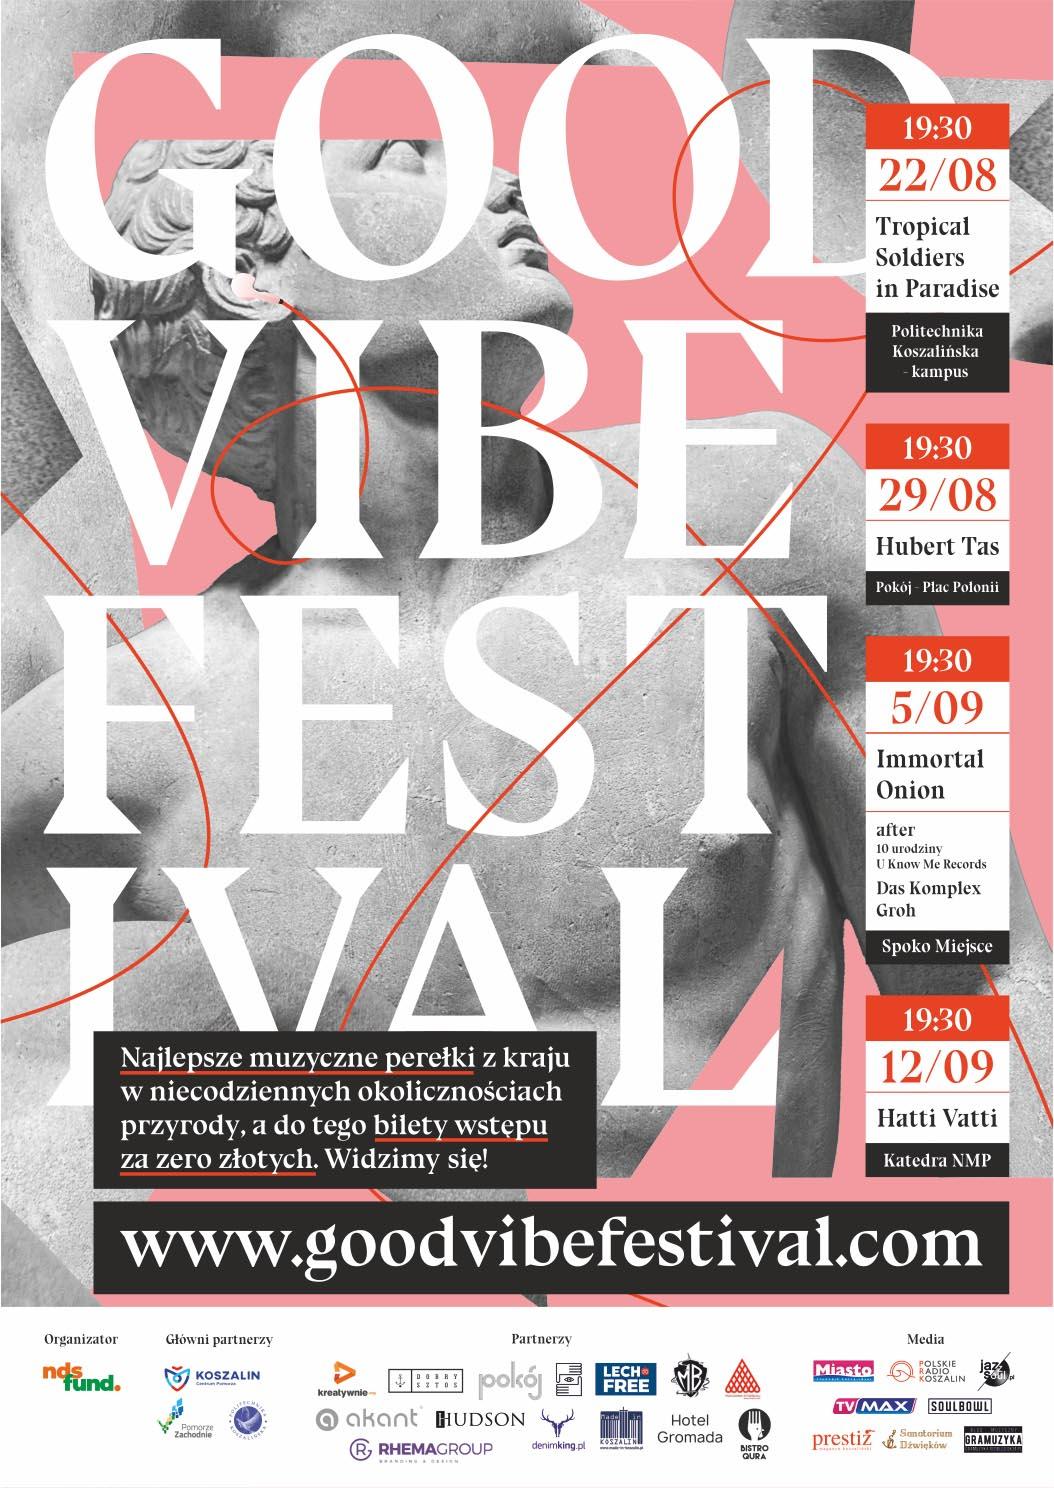 Good Vibe Festival 2020